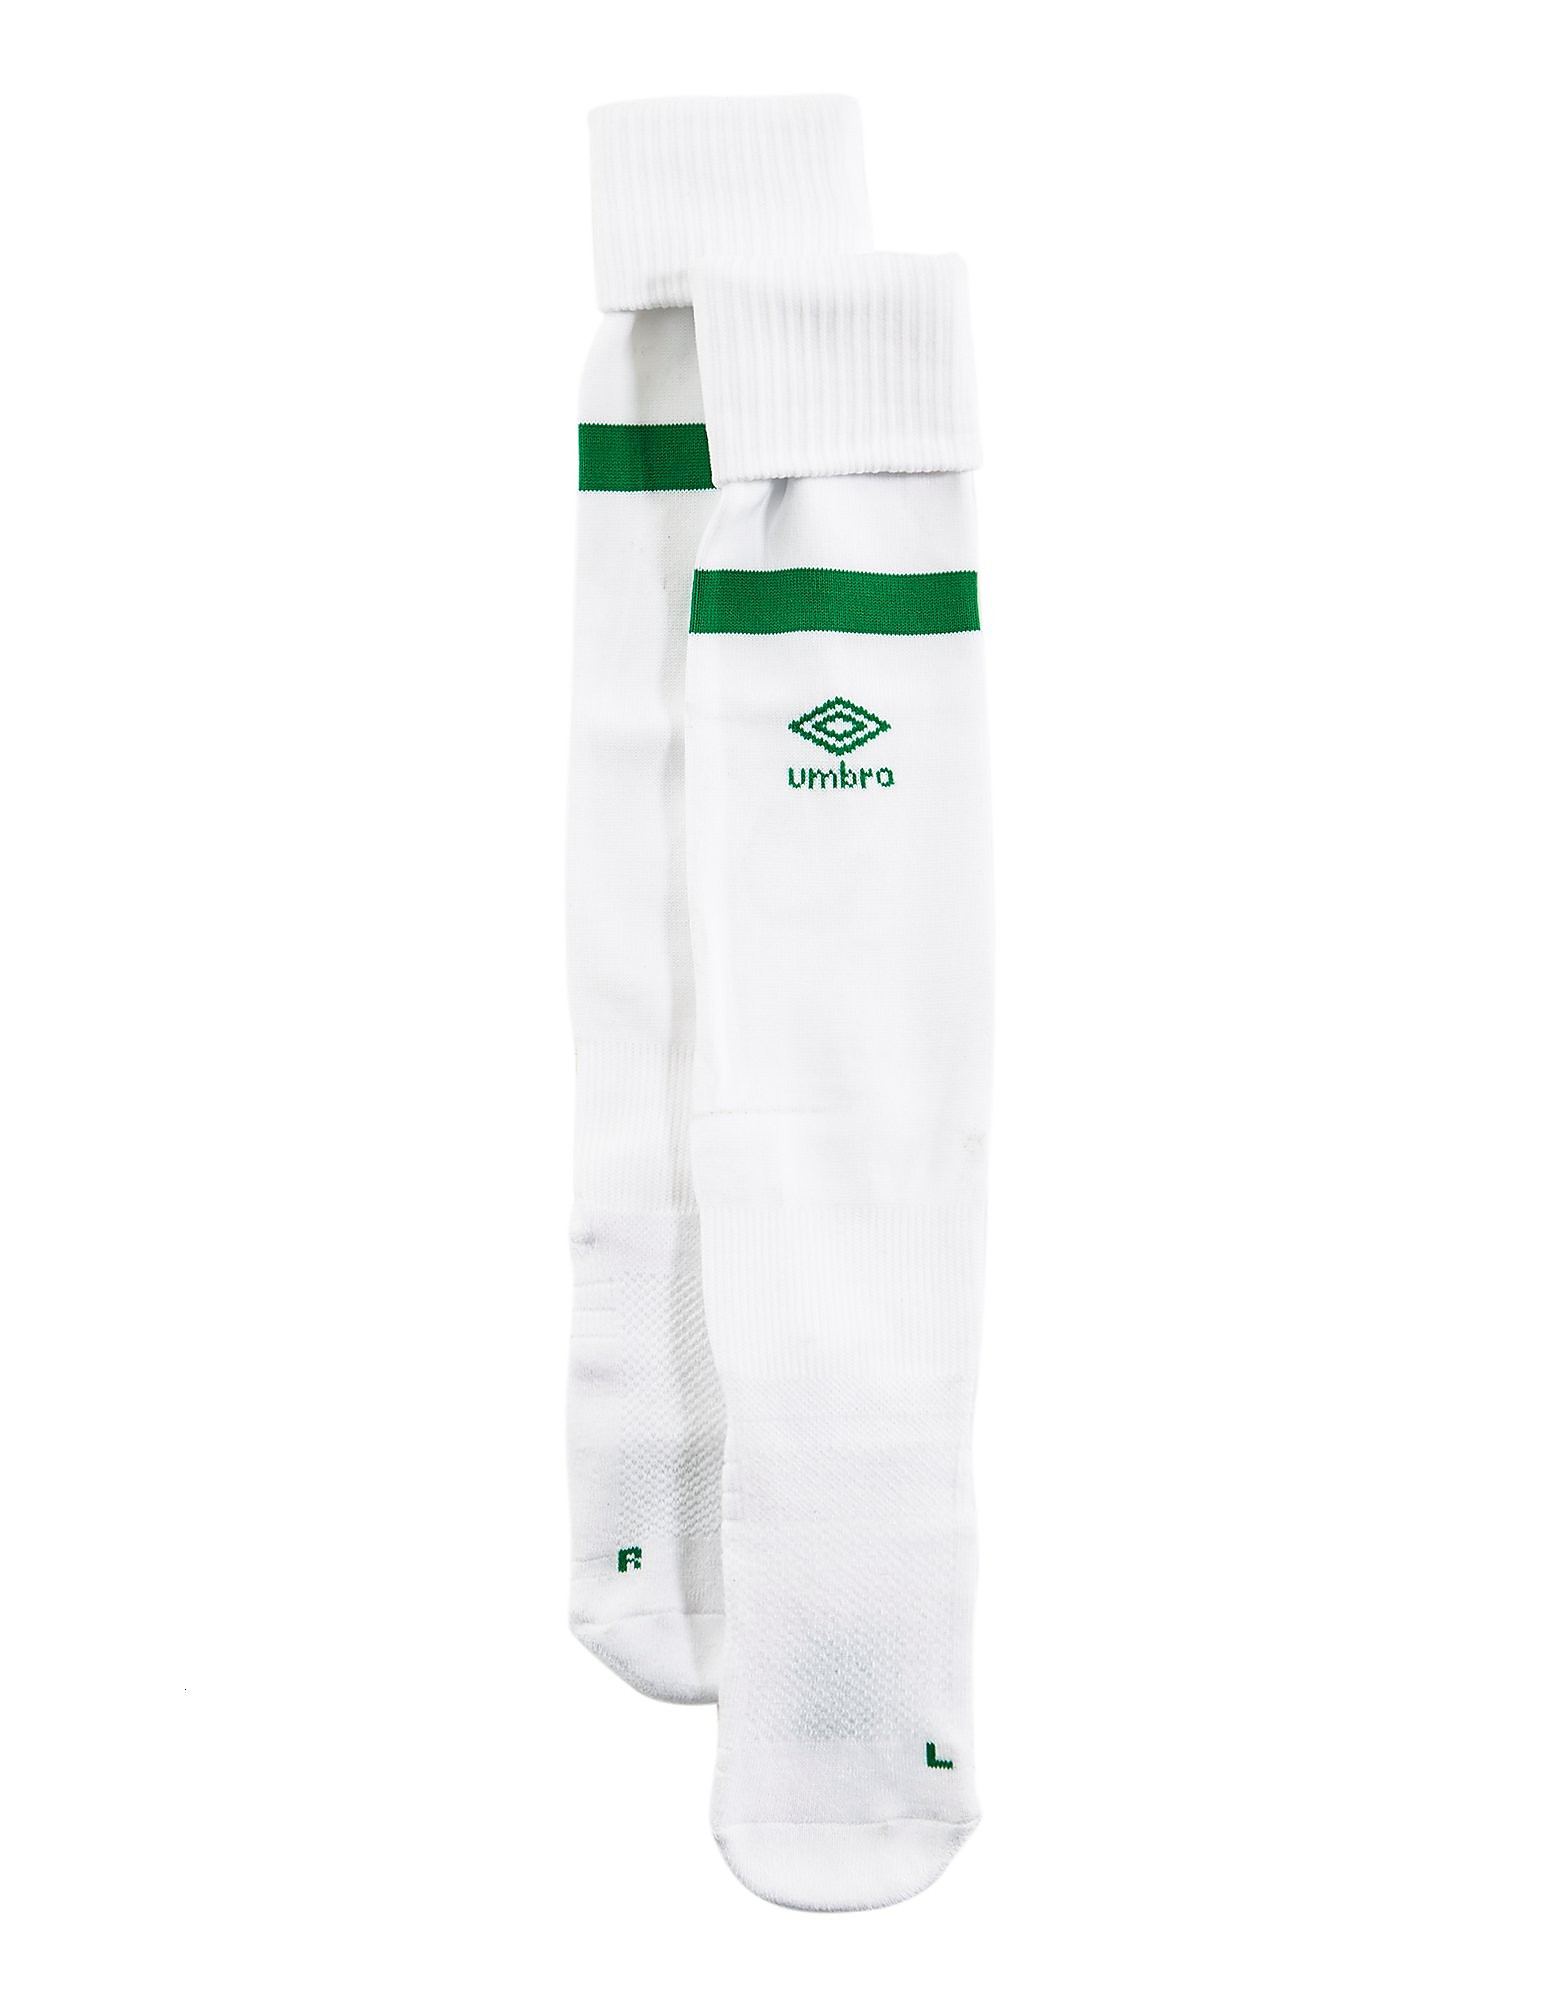 Umbro Republic of Ireland 2016 Jnr Away Socks